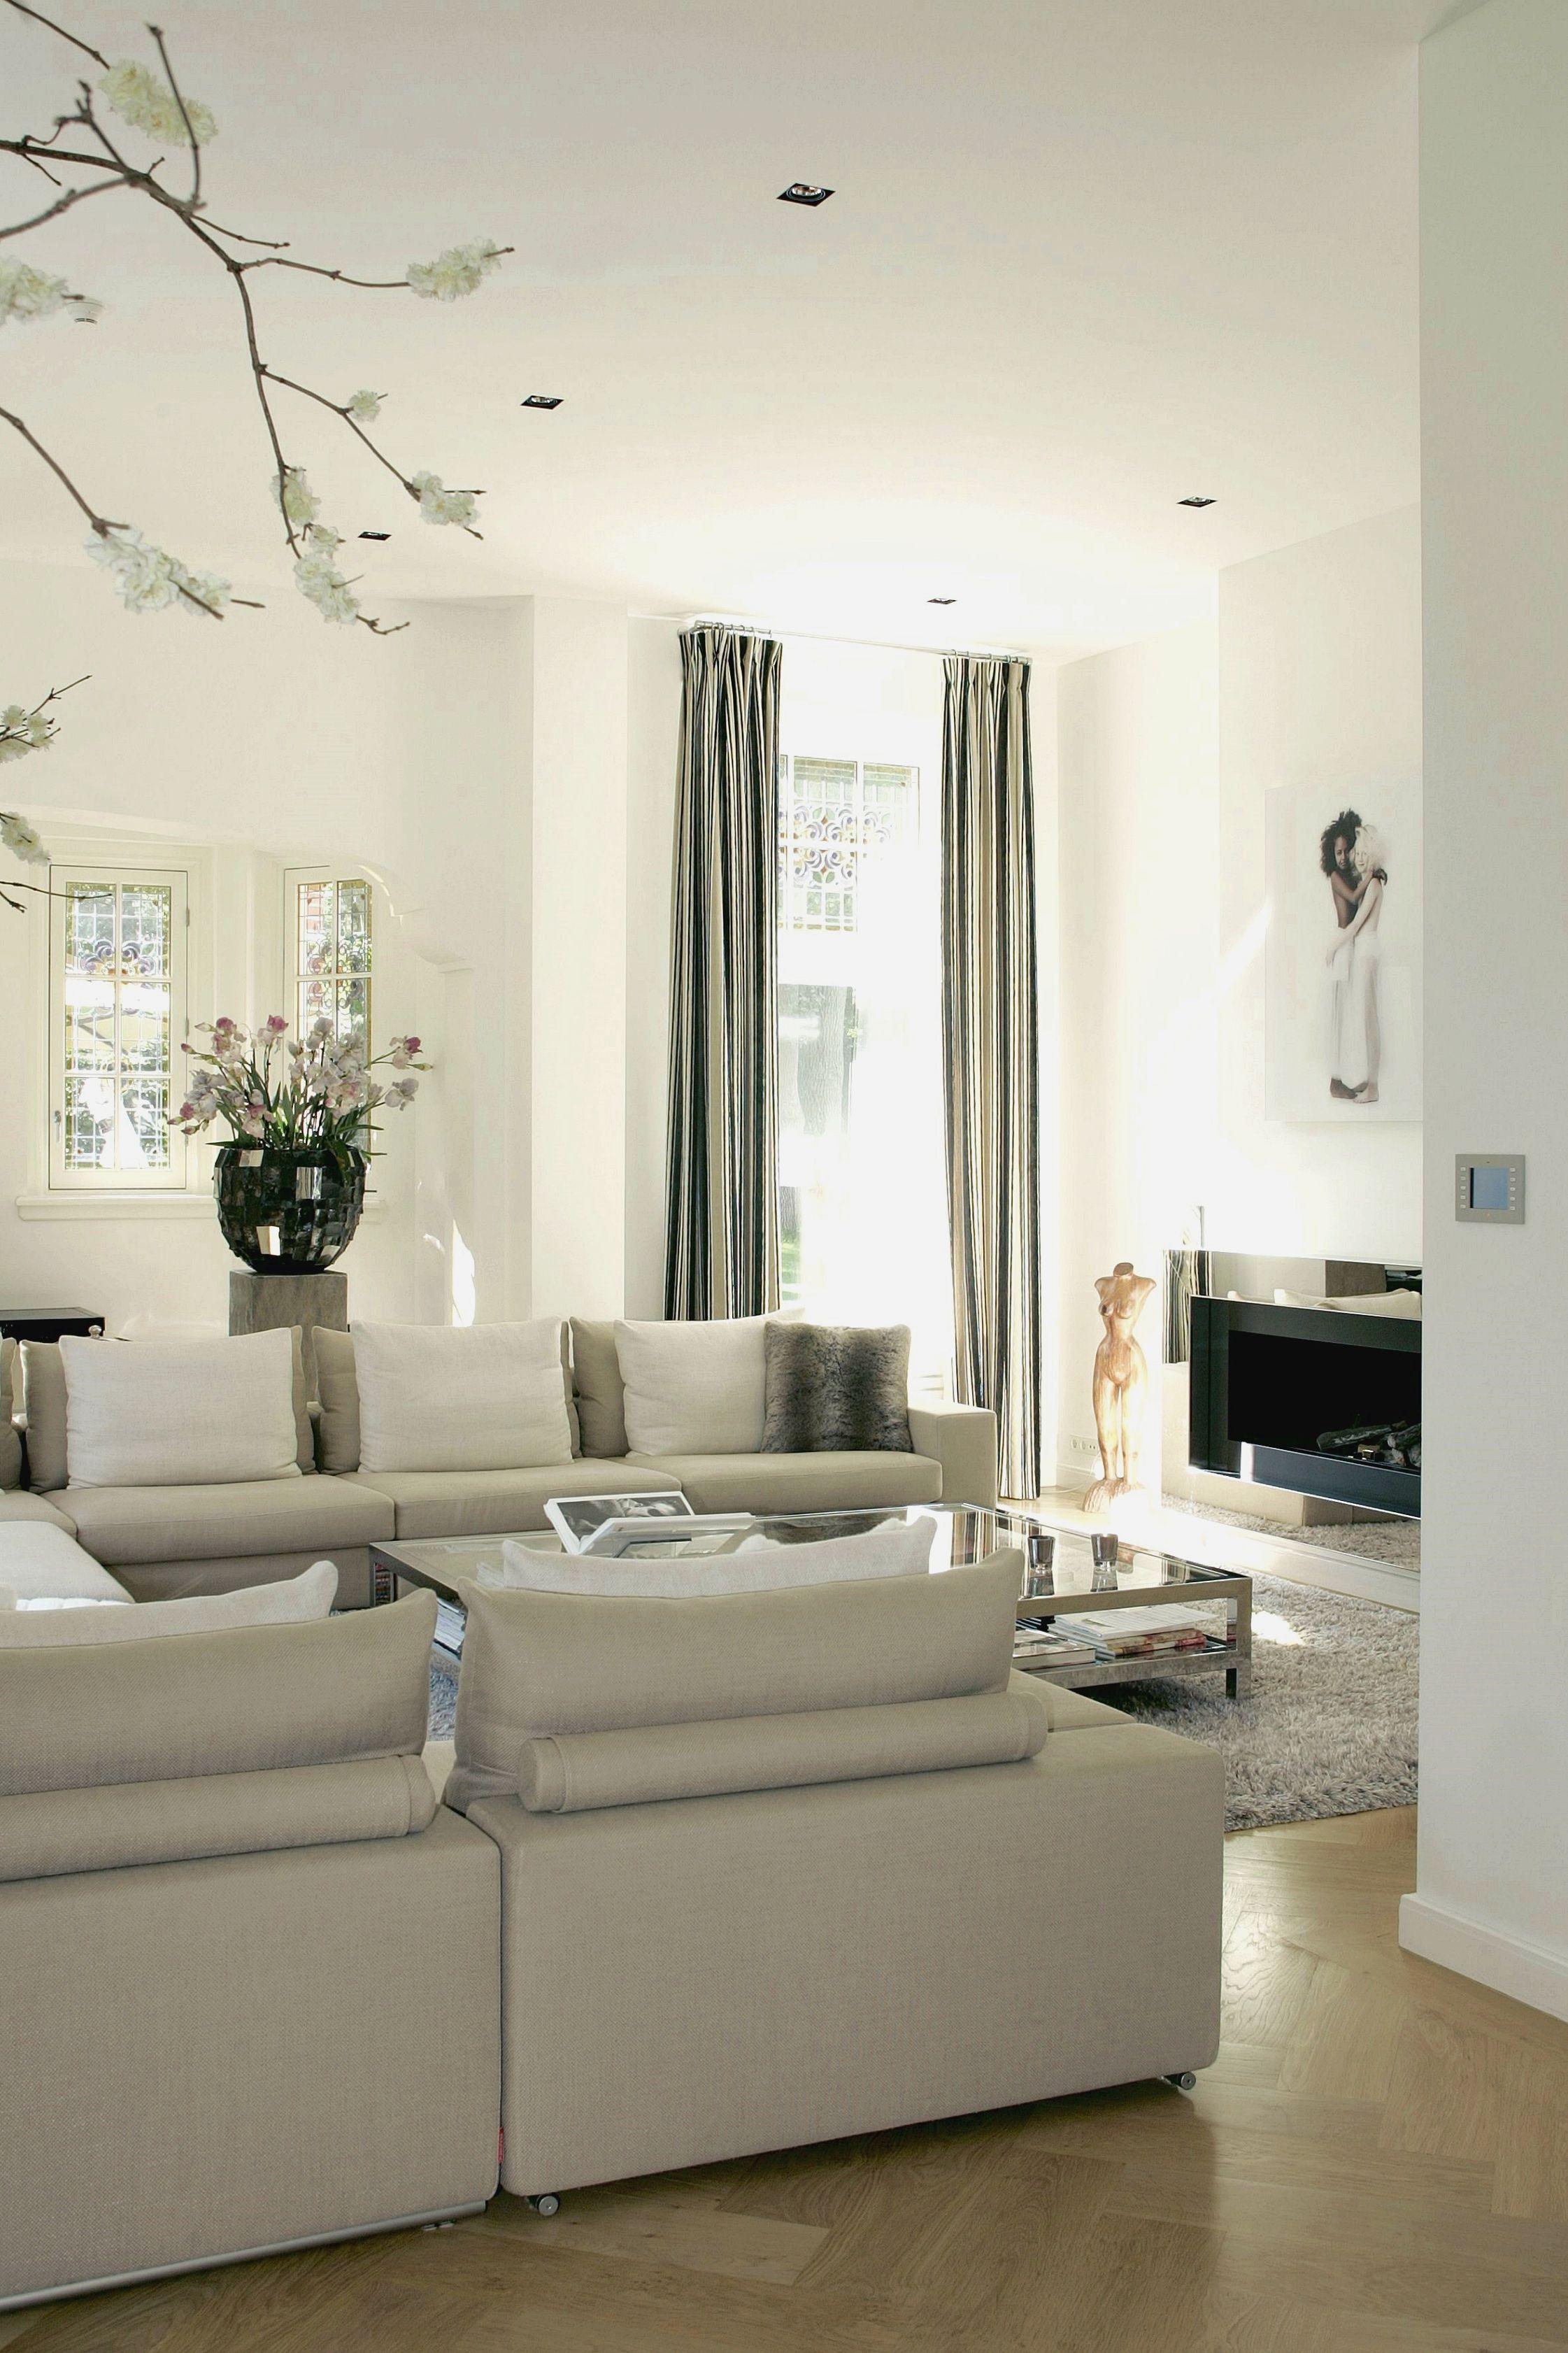 modern living room decor living room decor tips simple on amazing inspiring modern living room ideas for your home id=26744